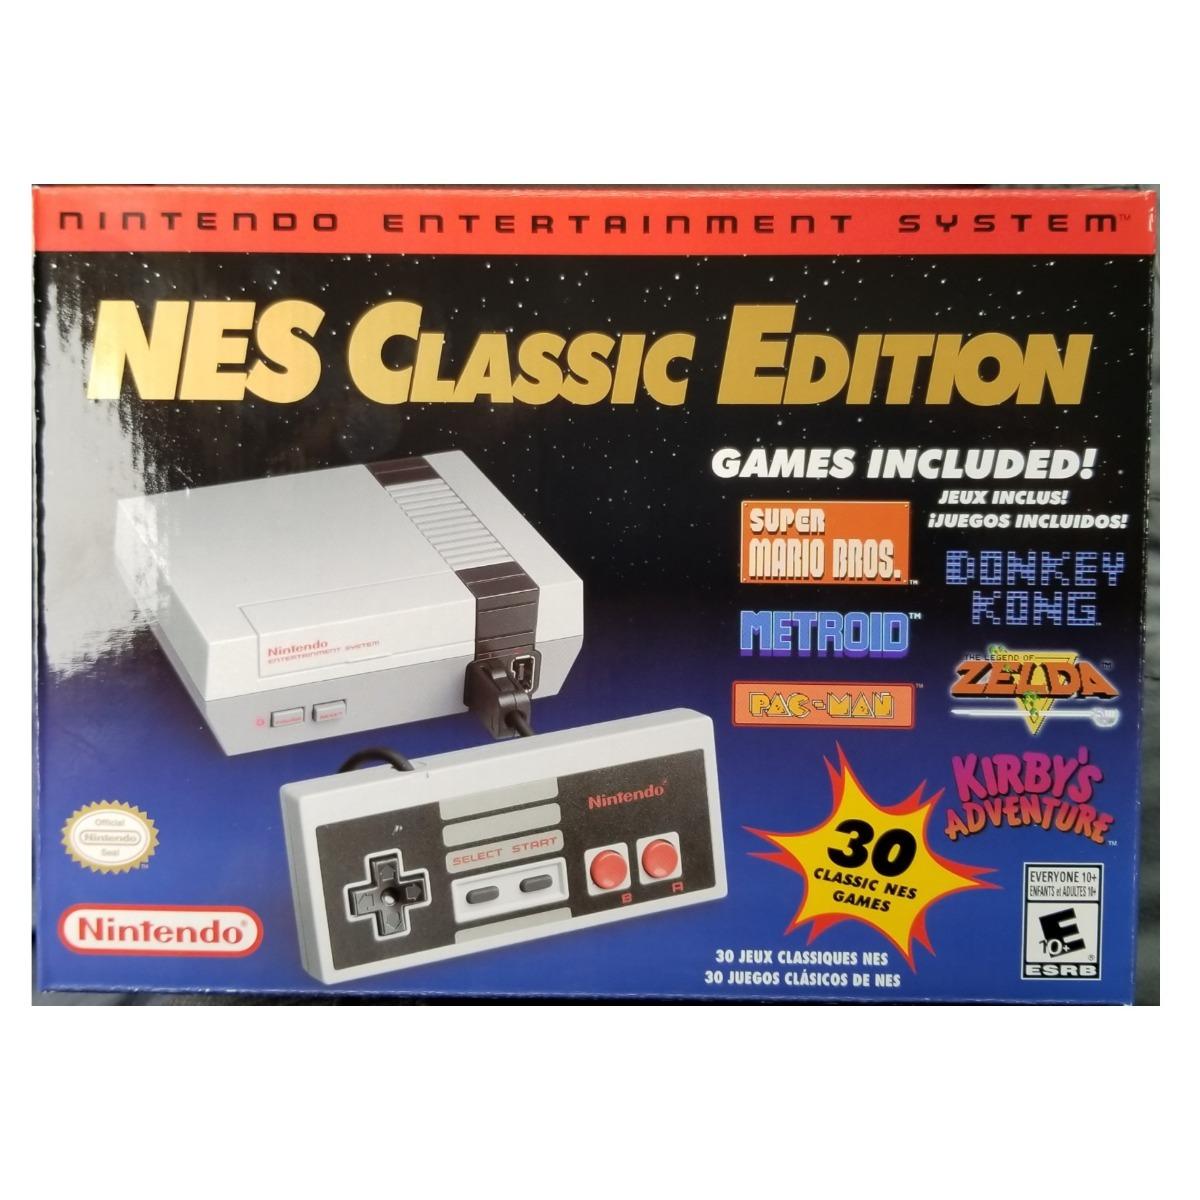 Nintendo Classic Mini 30 Juegos Clasicos Nes Zelda Mario